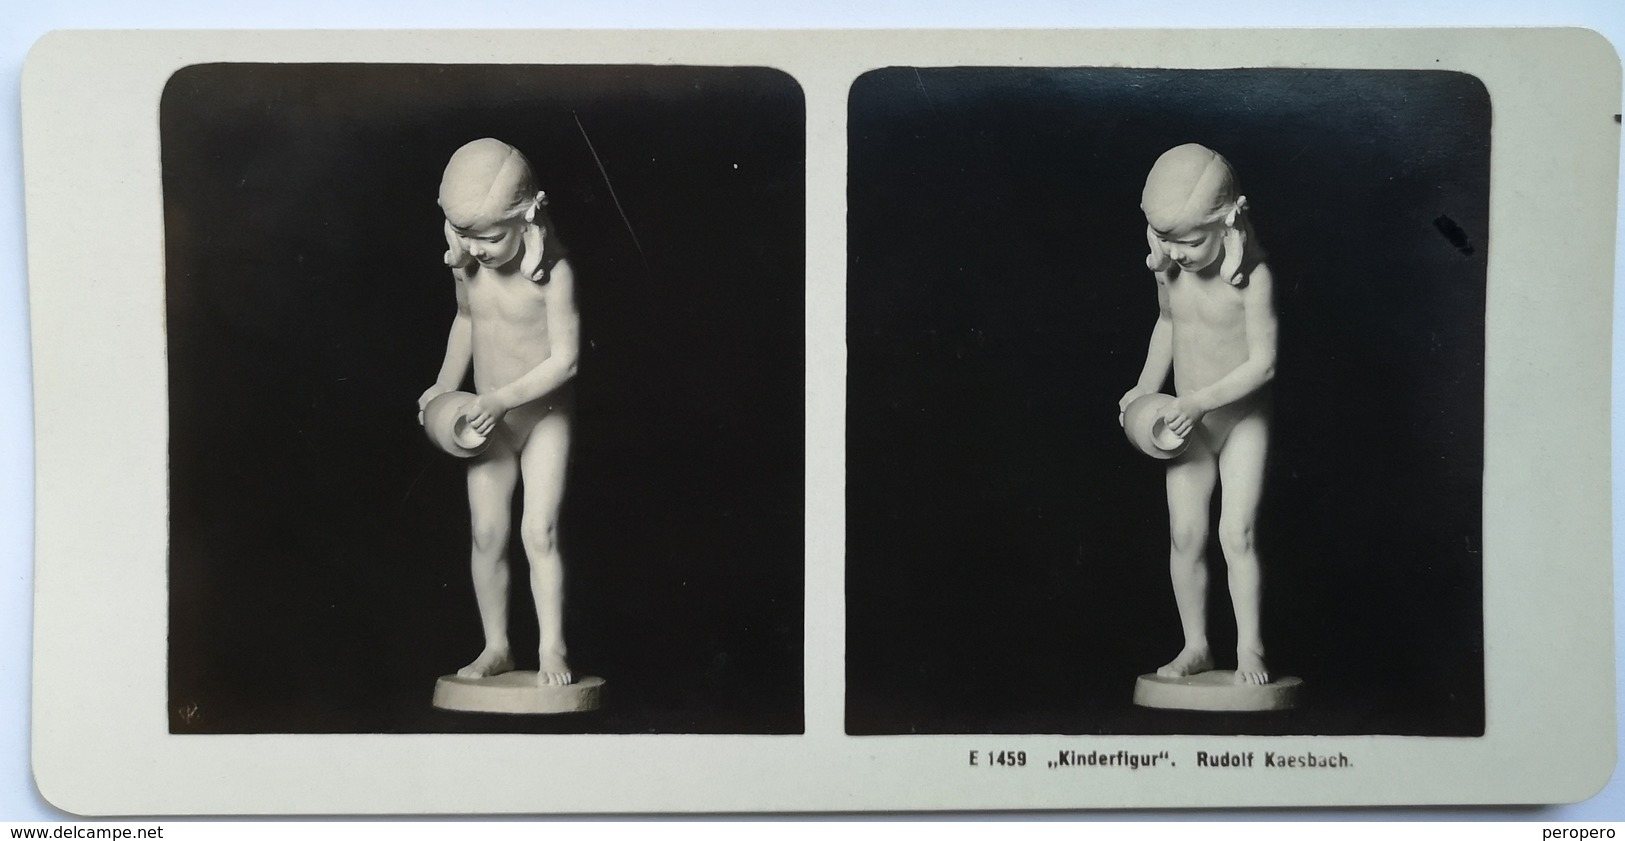 PHOTO STEREOSCOPIC STEREO A CHILDS STATUE KINDERFIGUR   ART  RUDOLF KAESBACH - Stereo-Photographie